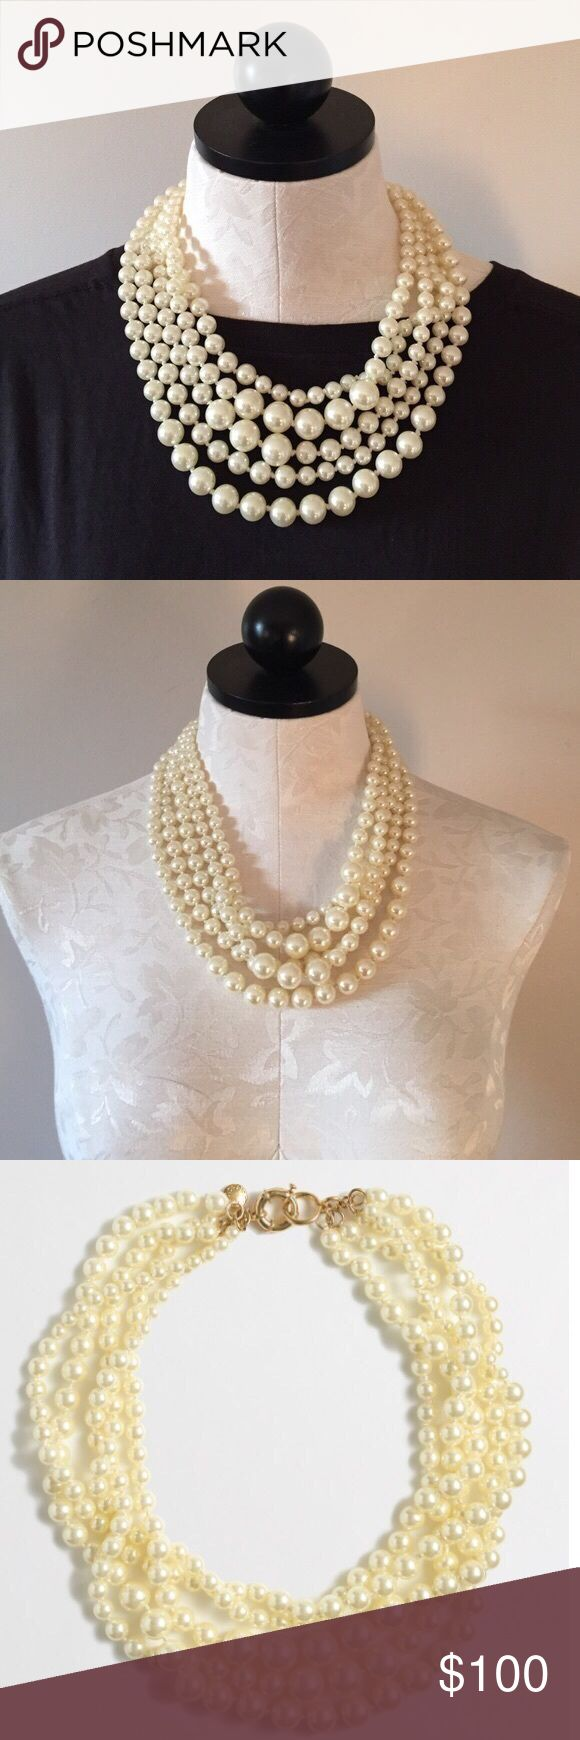 2x Hp Nwt J Crew Multi Strand Pearl Necklace! Nwt